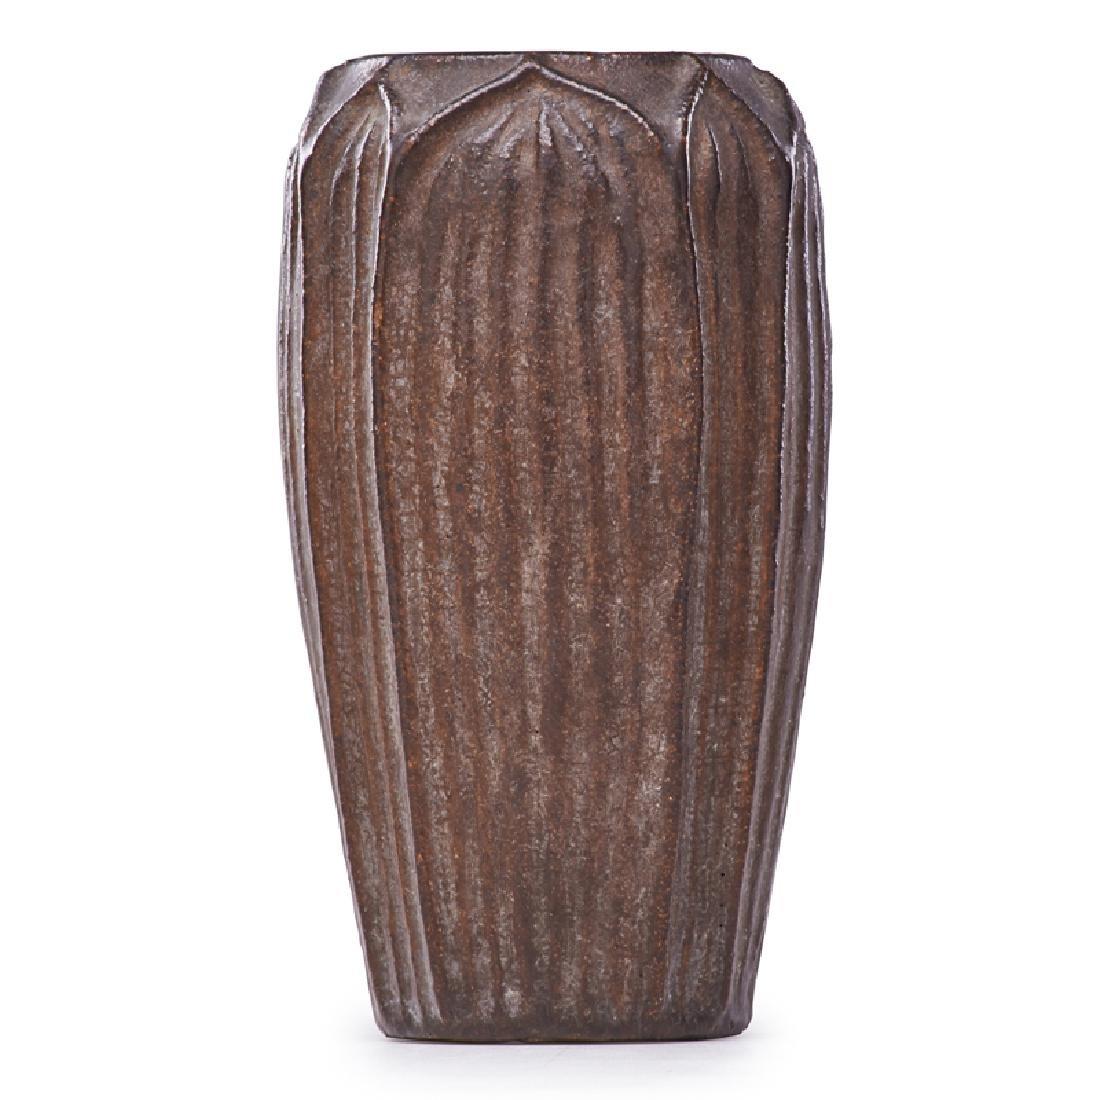 WHEATLEY Vase